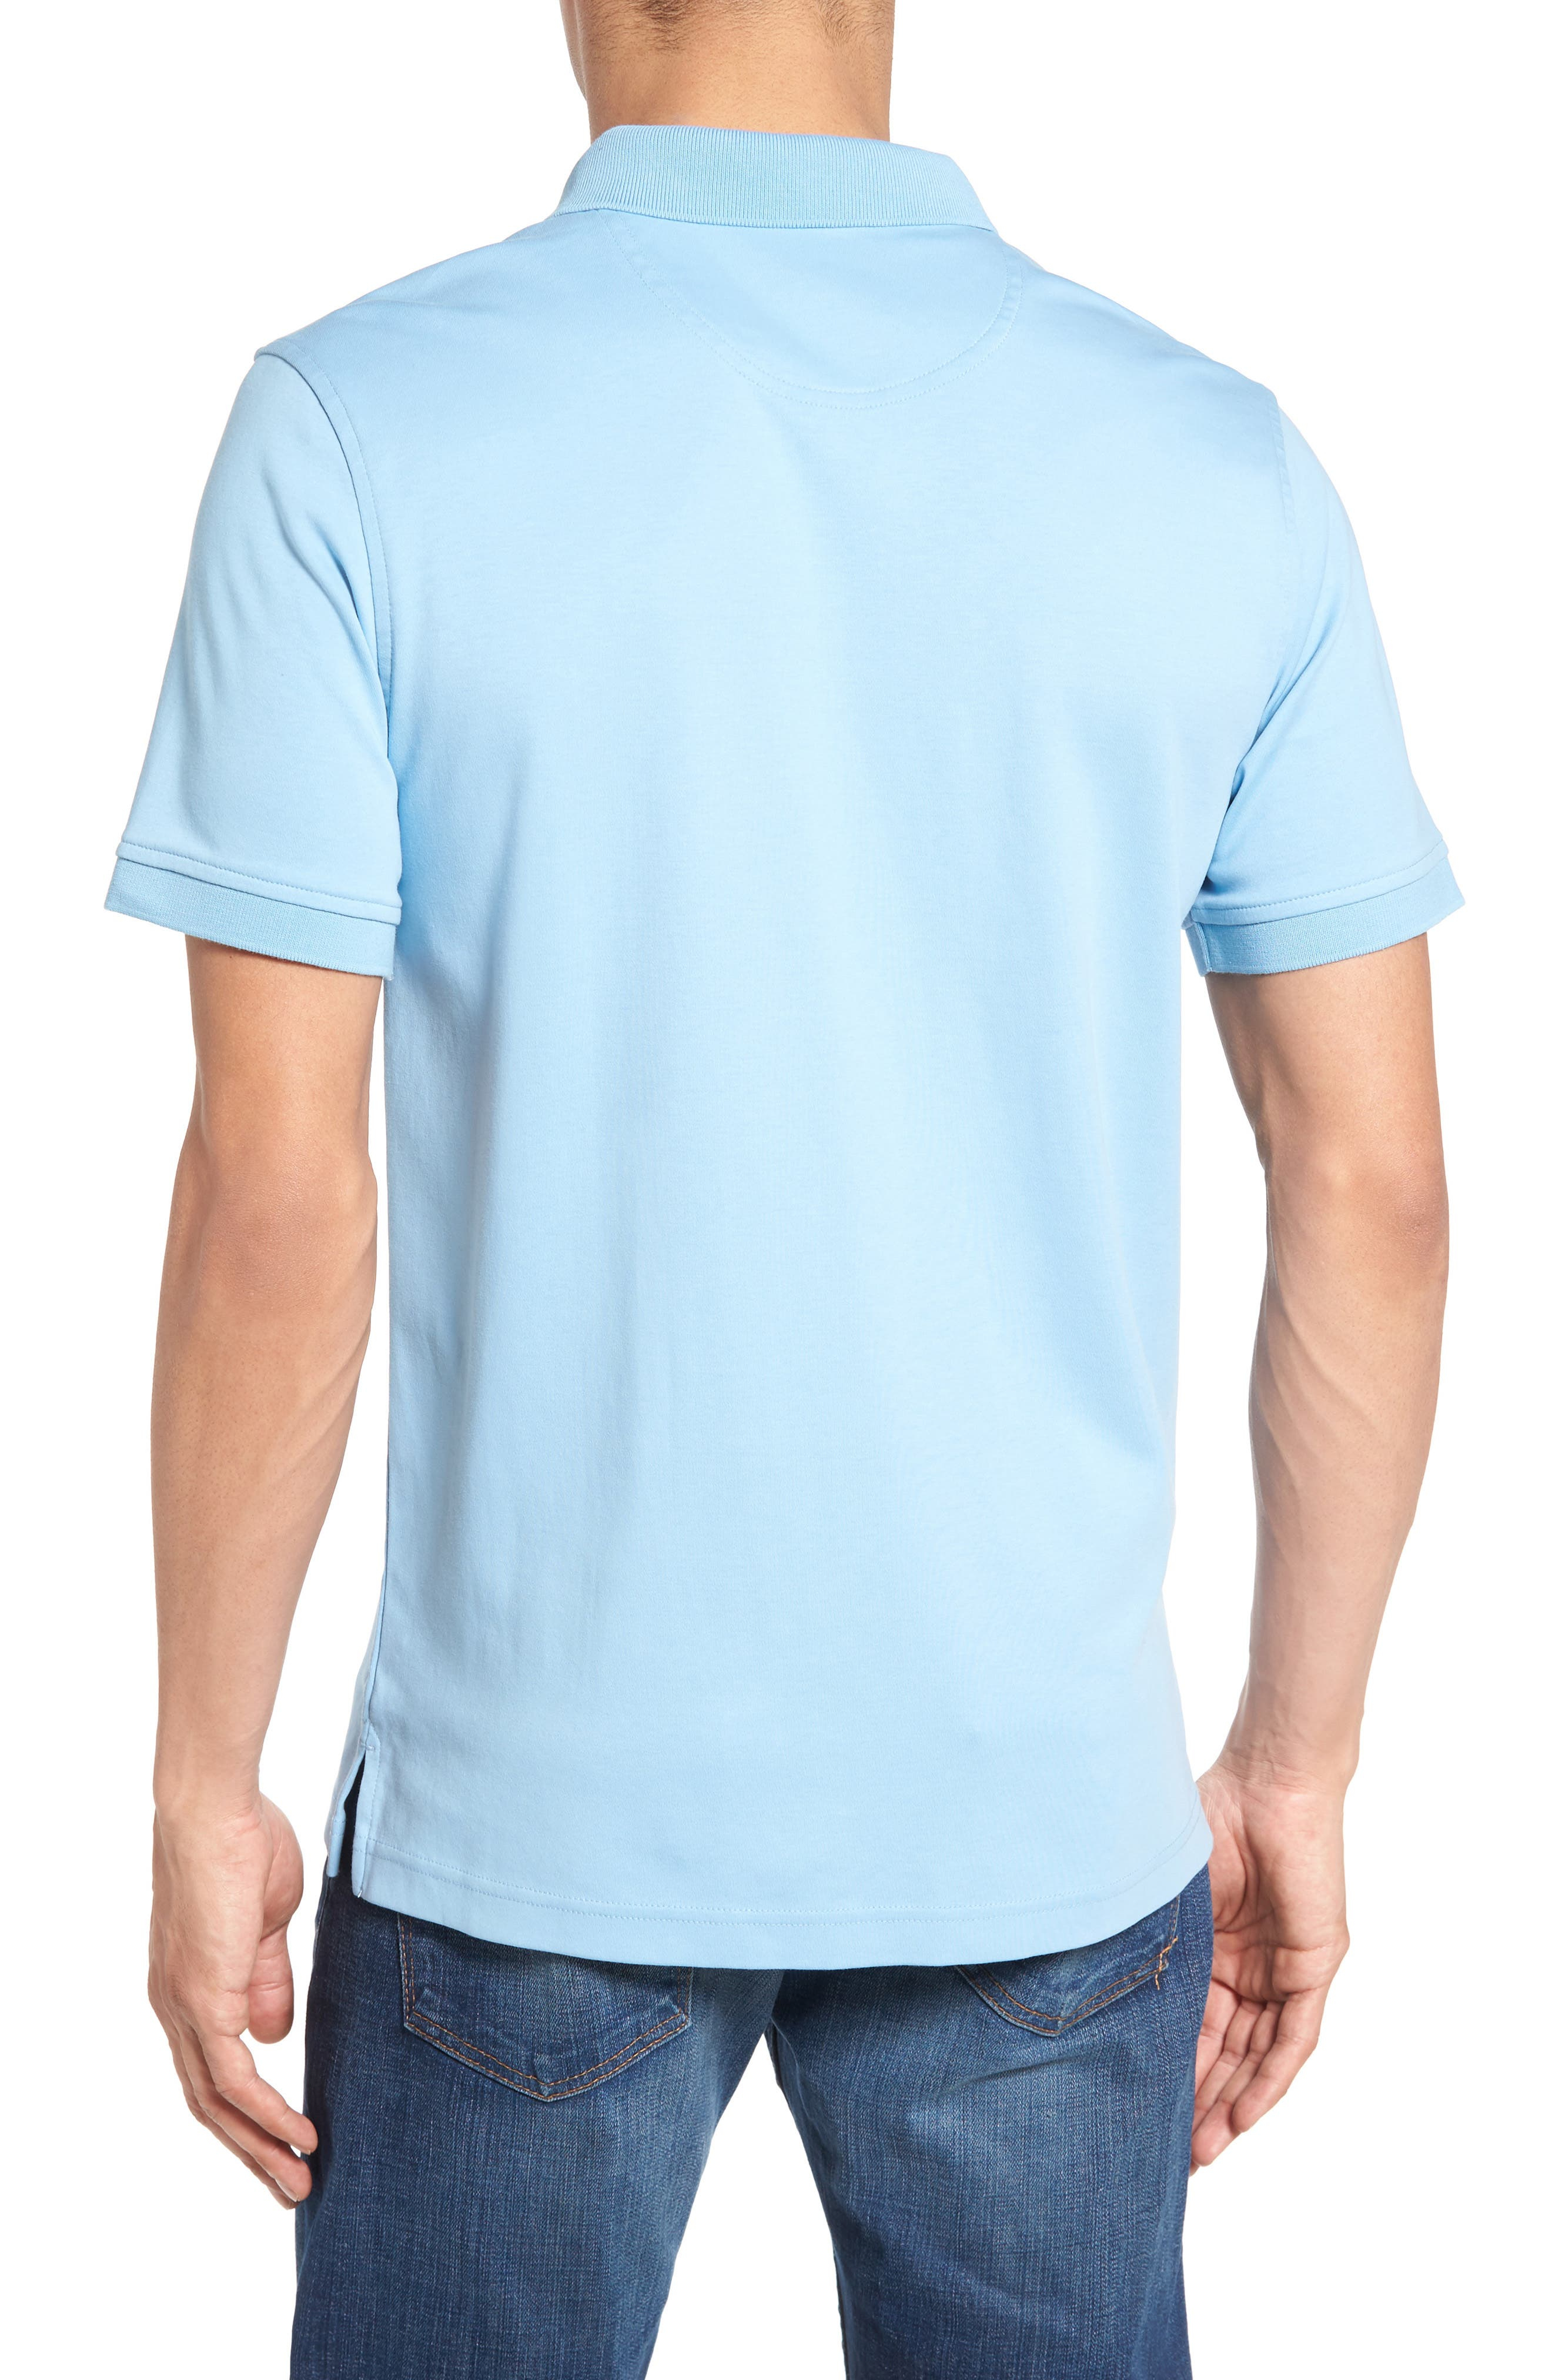 Alternate Image 2  - Nordstrom Men's Shop Slim Fit Interlock Knit Polo